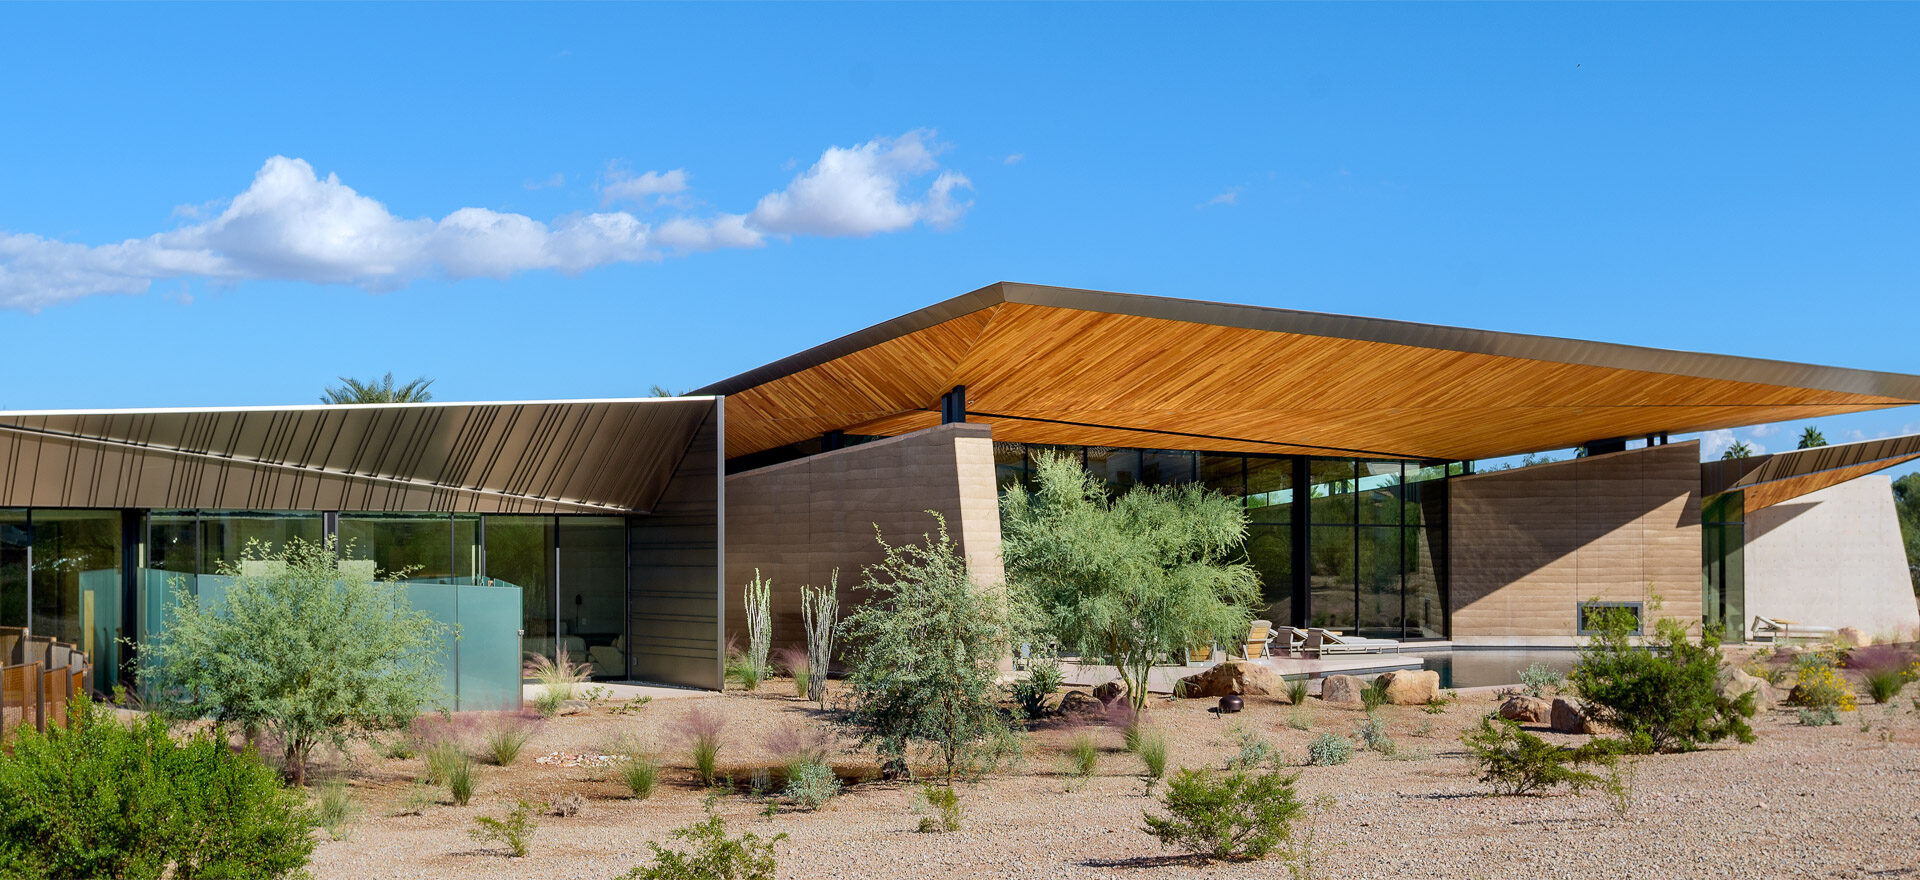 Dancing Light, Brent Kendle, Kendle Design Collaborative, Paradise Valley, Arizona, David Michael Miller, GBtwo Landscape Architecture, architecture